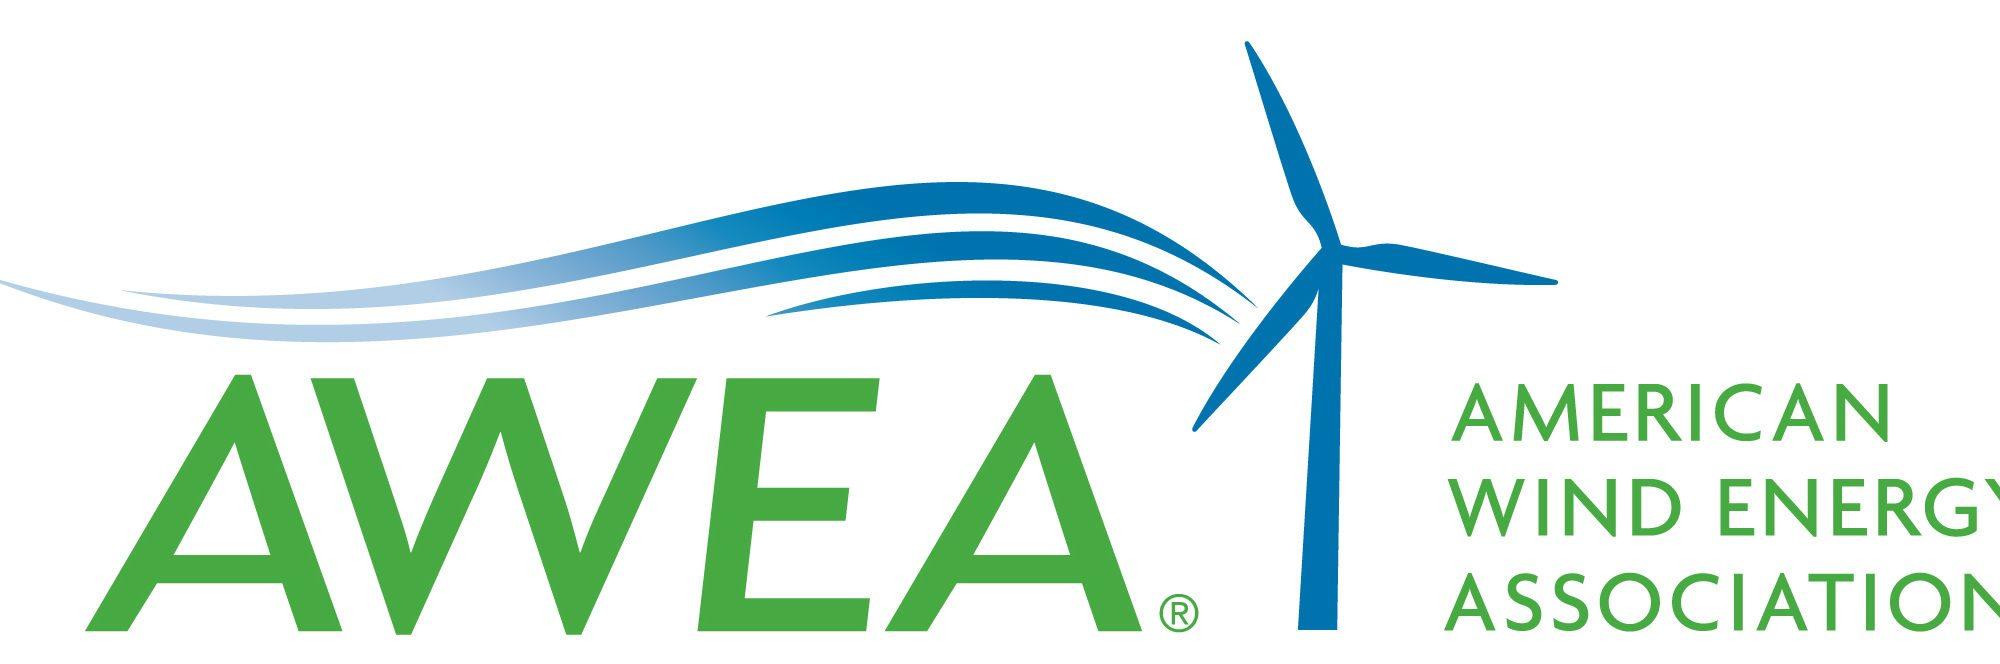 AWEA-Logo-2000x664